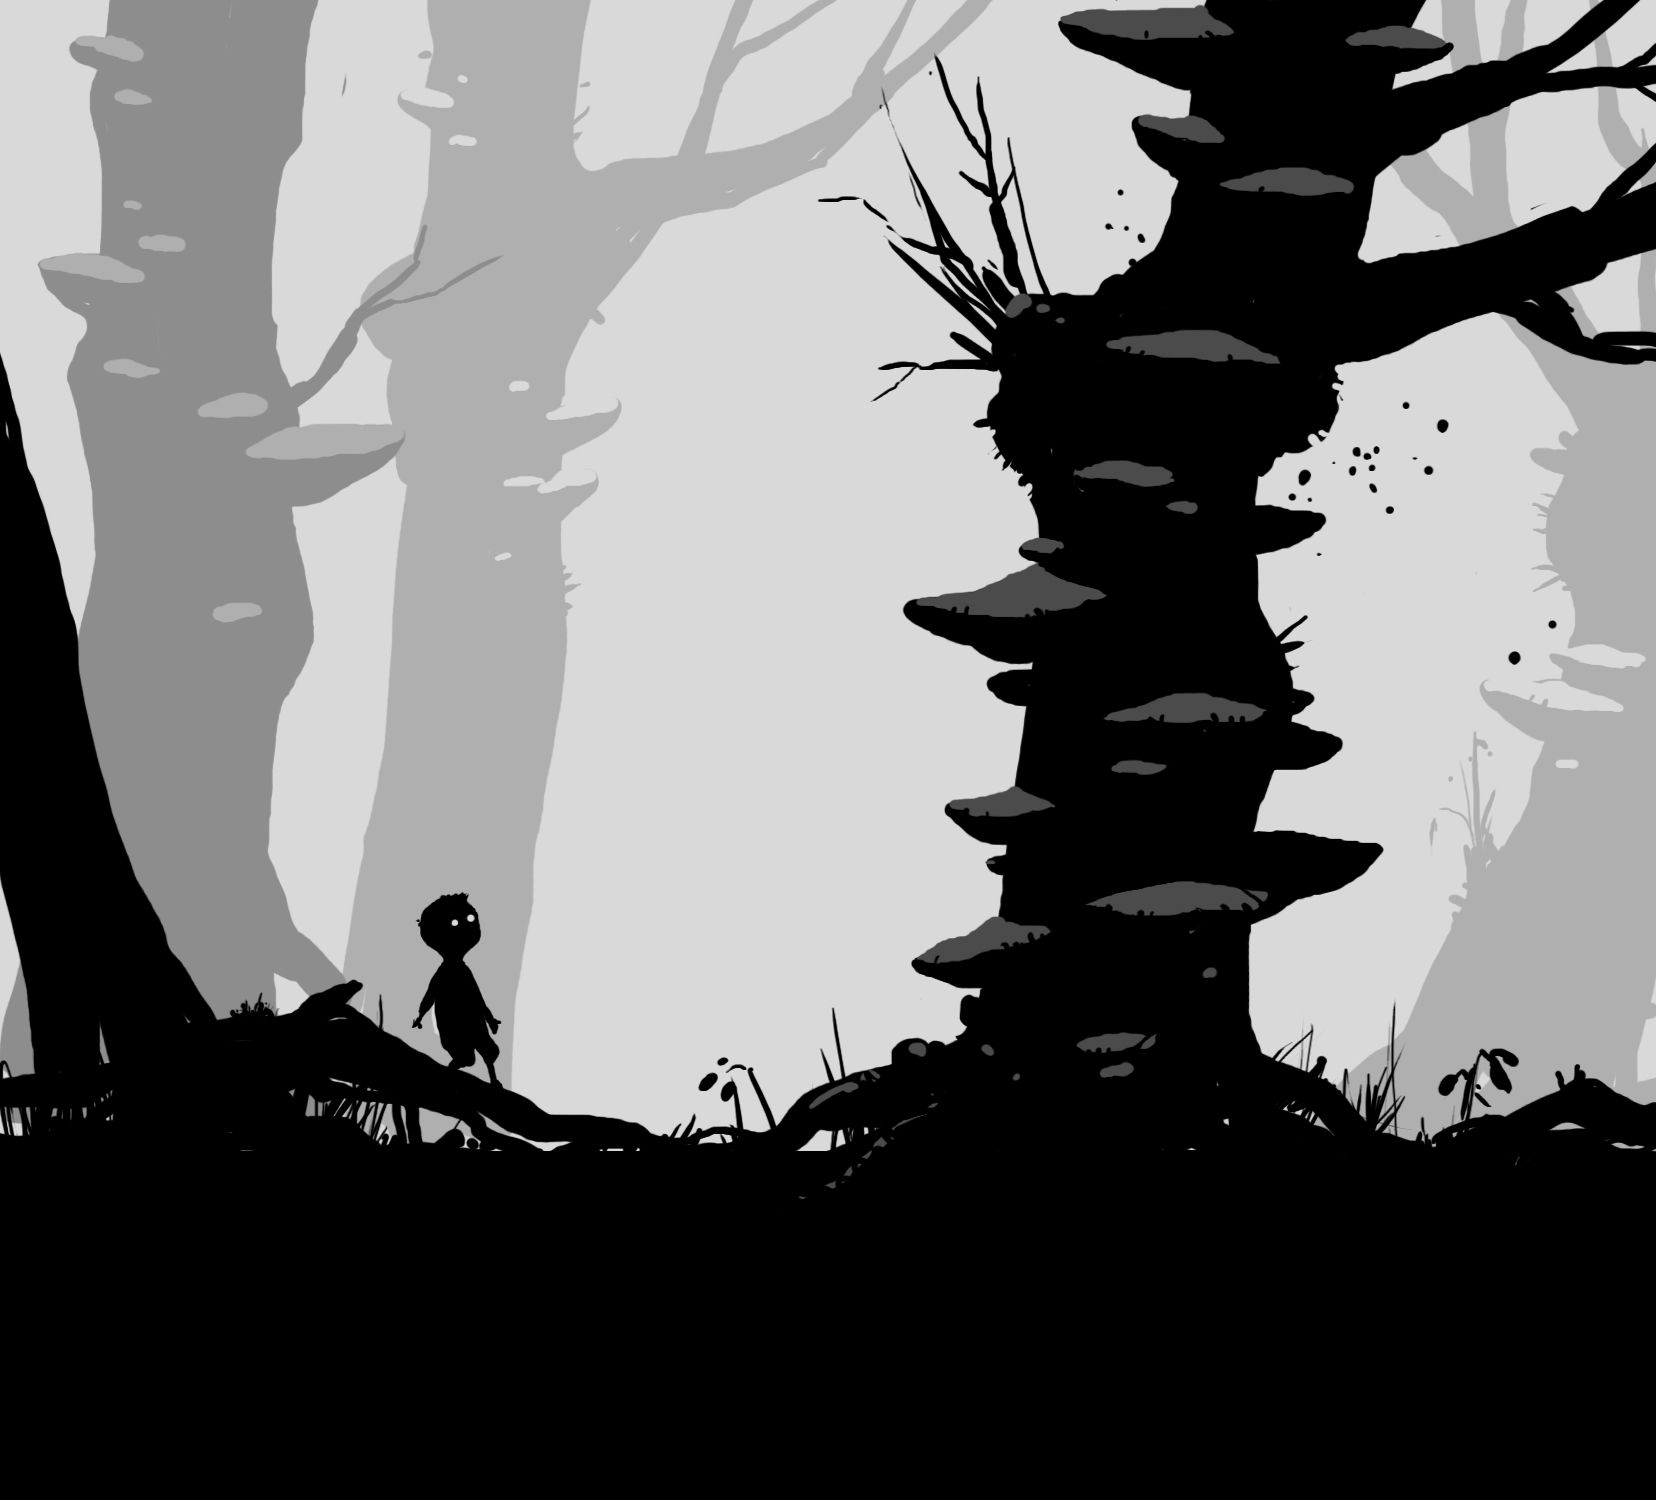 Character Design Silhouette Tutorial : Limbo concept art no colour silhouette design